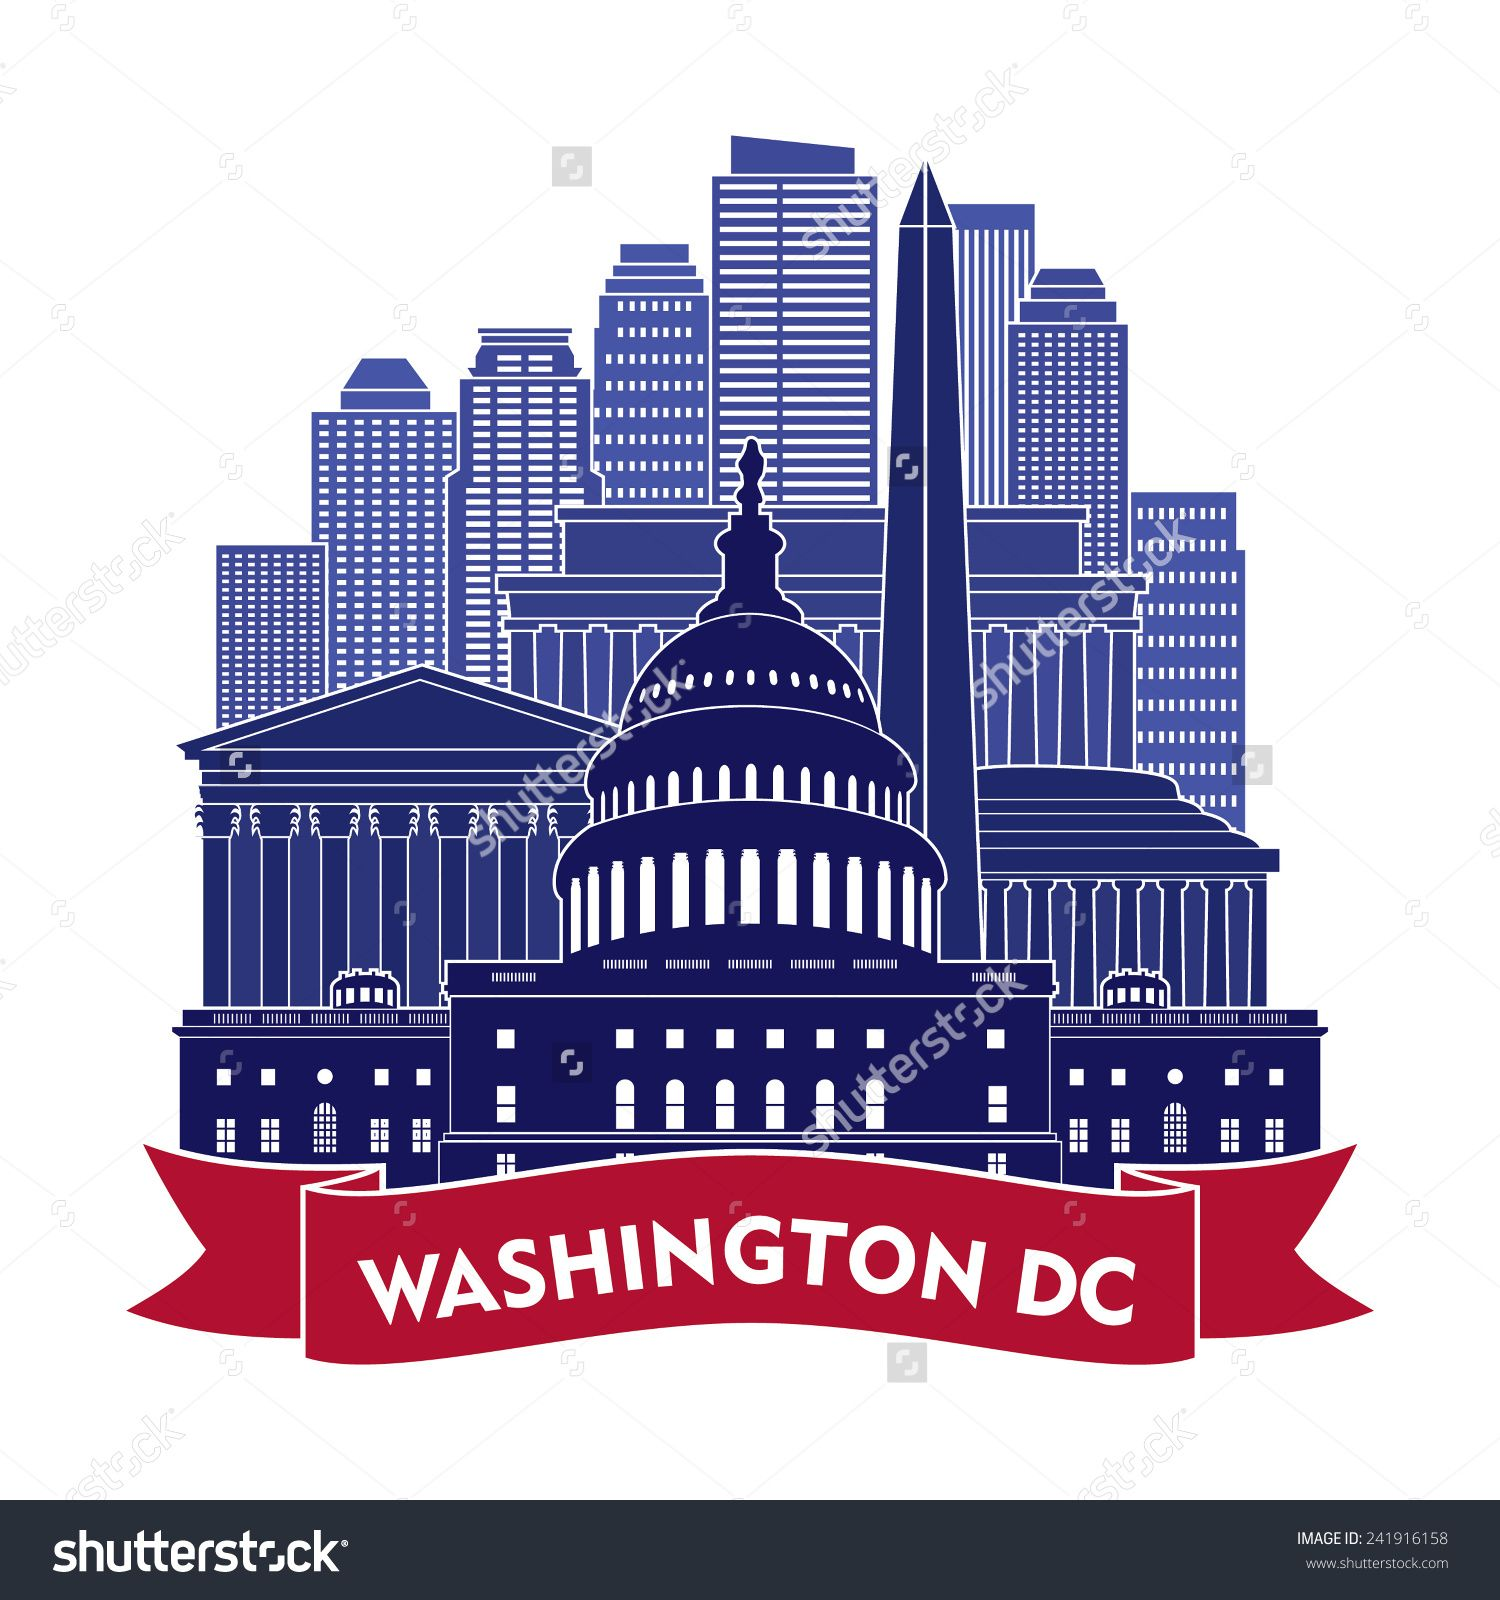 svg free library Washington dc clipart. Free google search